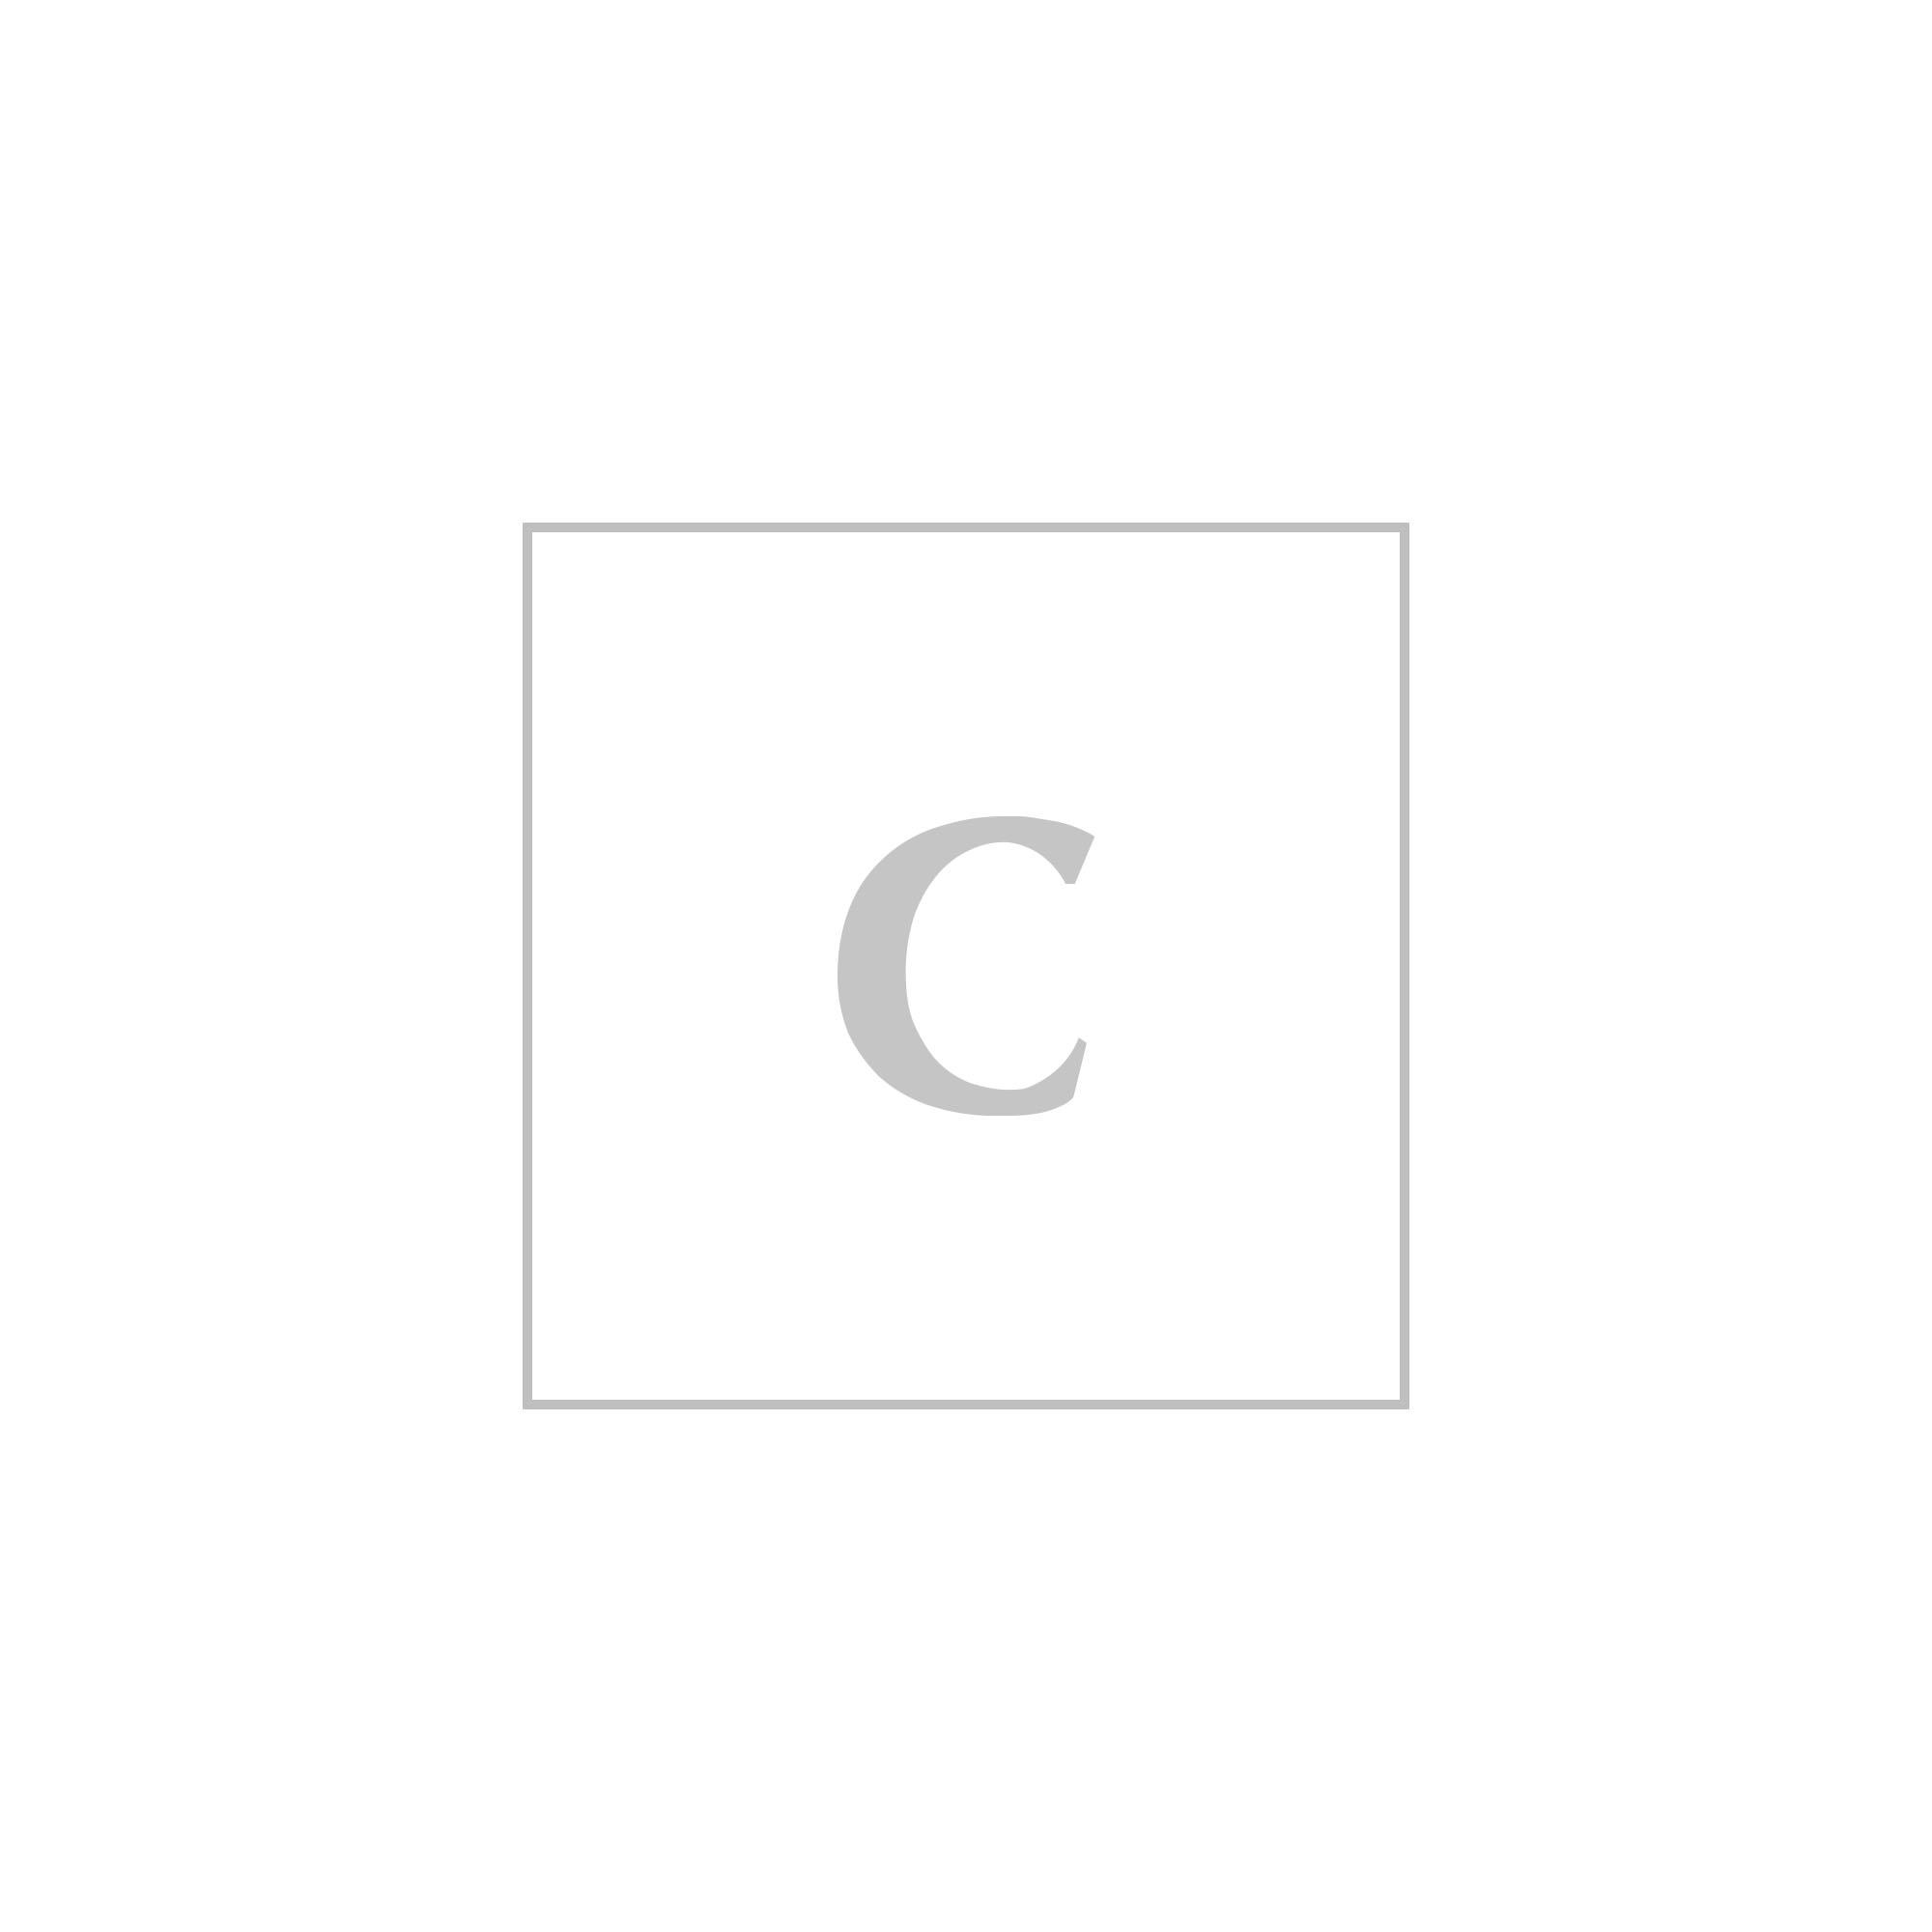 stella mccartney bags women falabella clutch